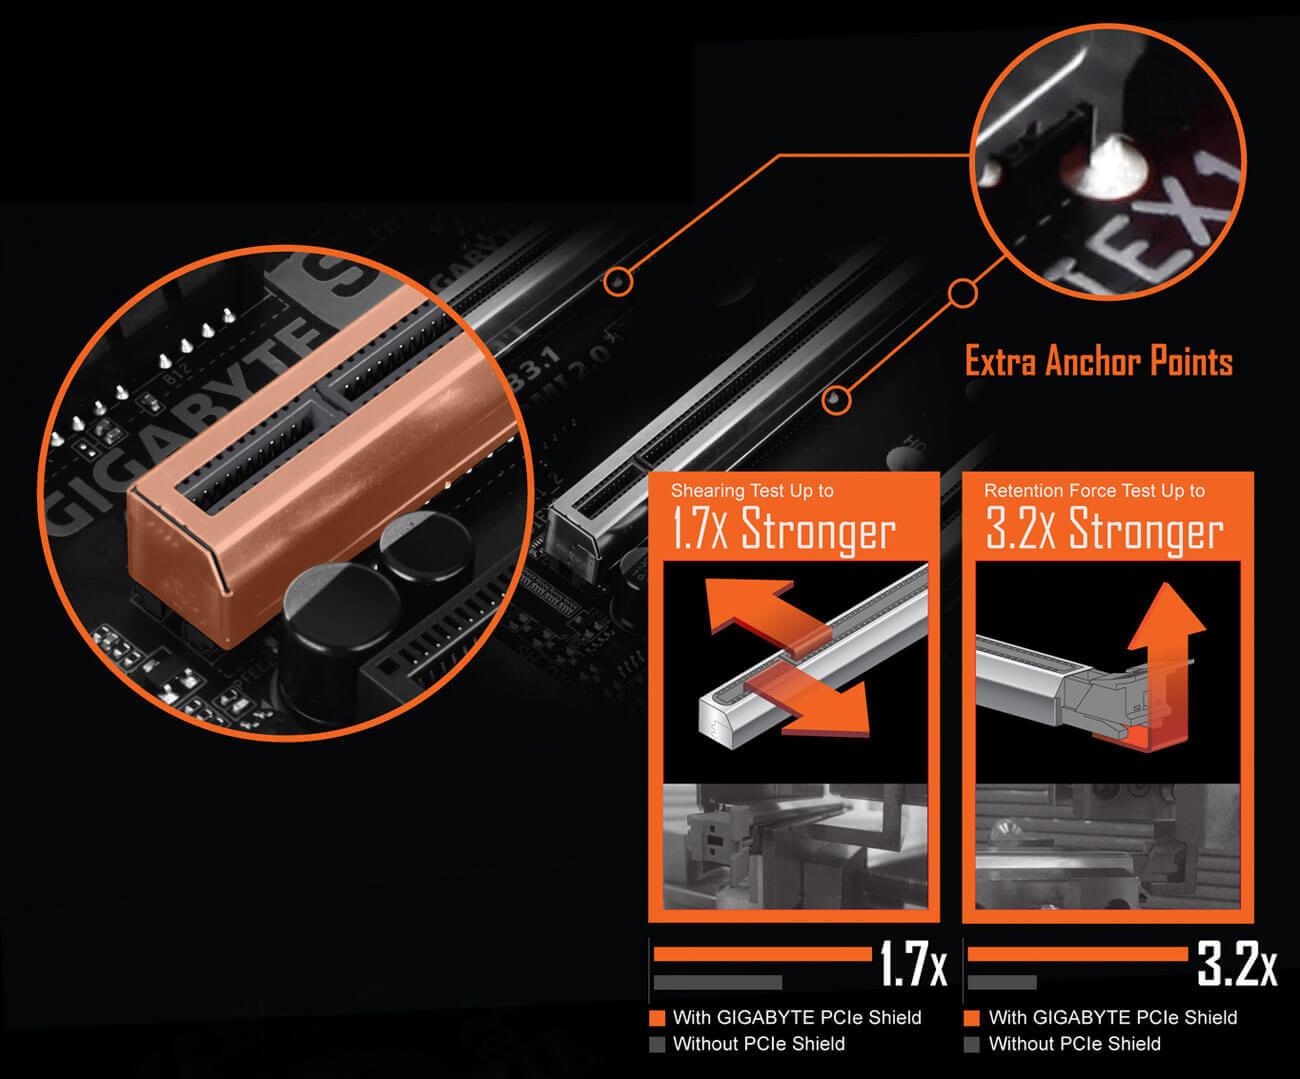 Gigabyte Z390 Aorus Elite Lga 1151 300 Series Intel Hdmi Sata 70 Watt Mosfet Audio Amplifier Schematic Pictures To Pin On Pinterest